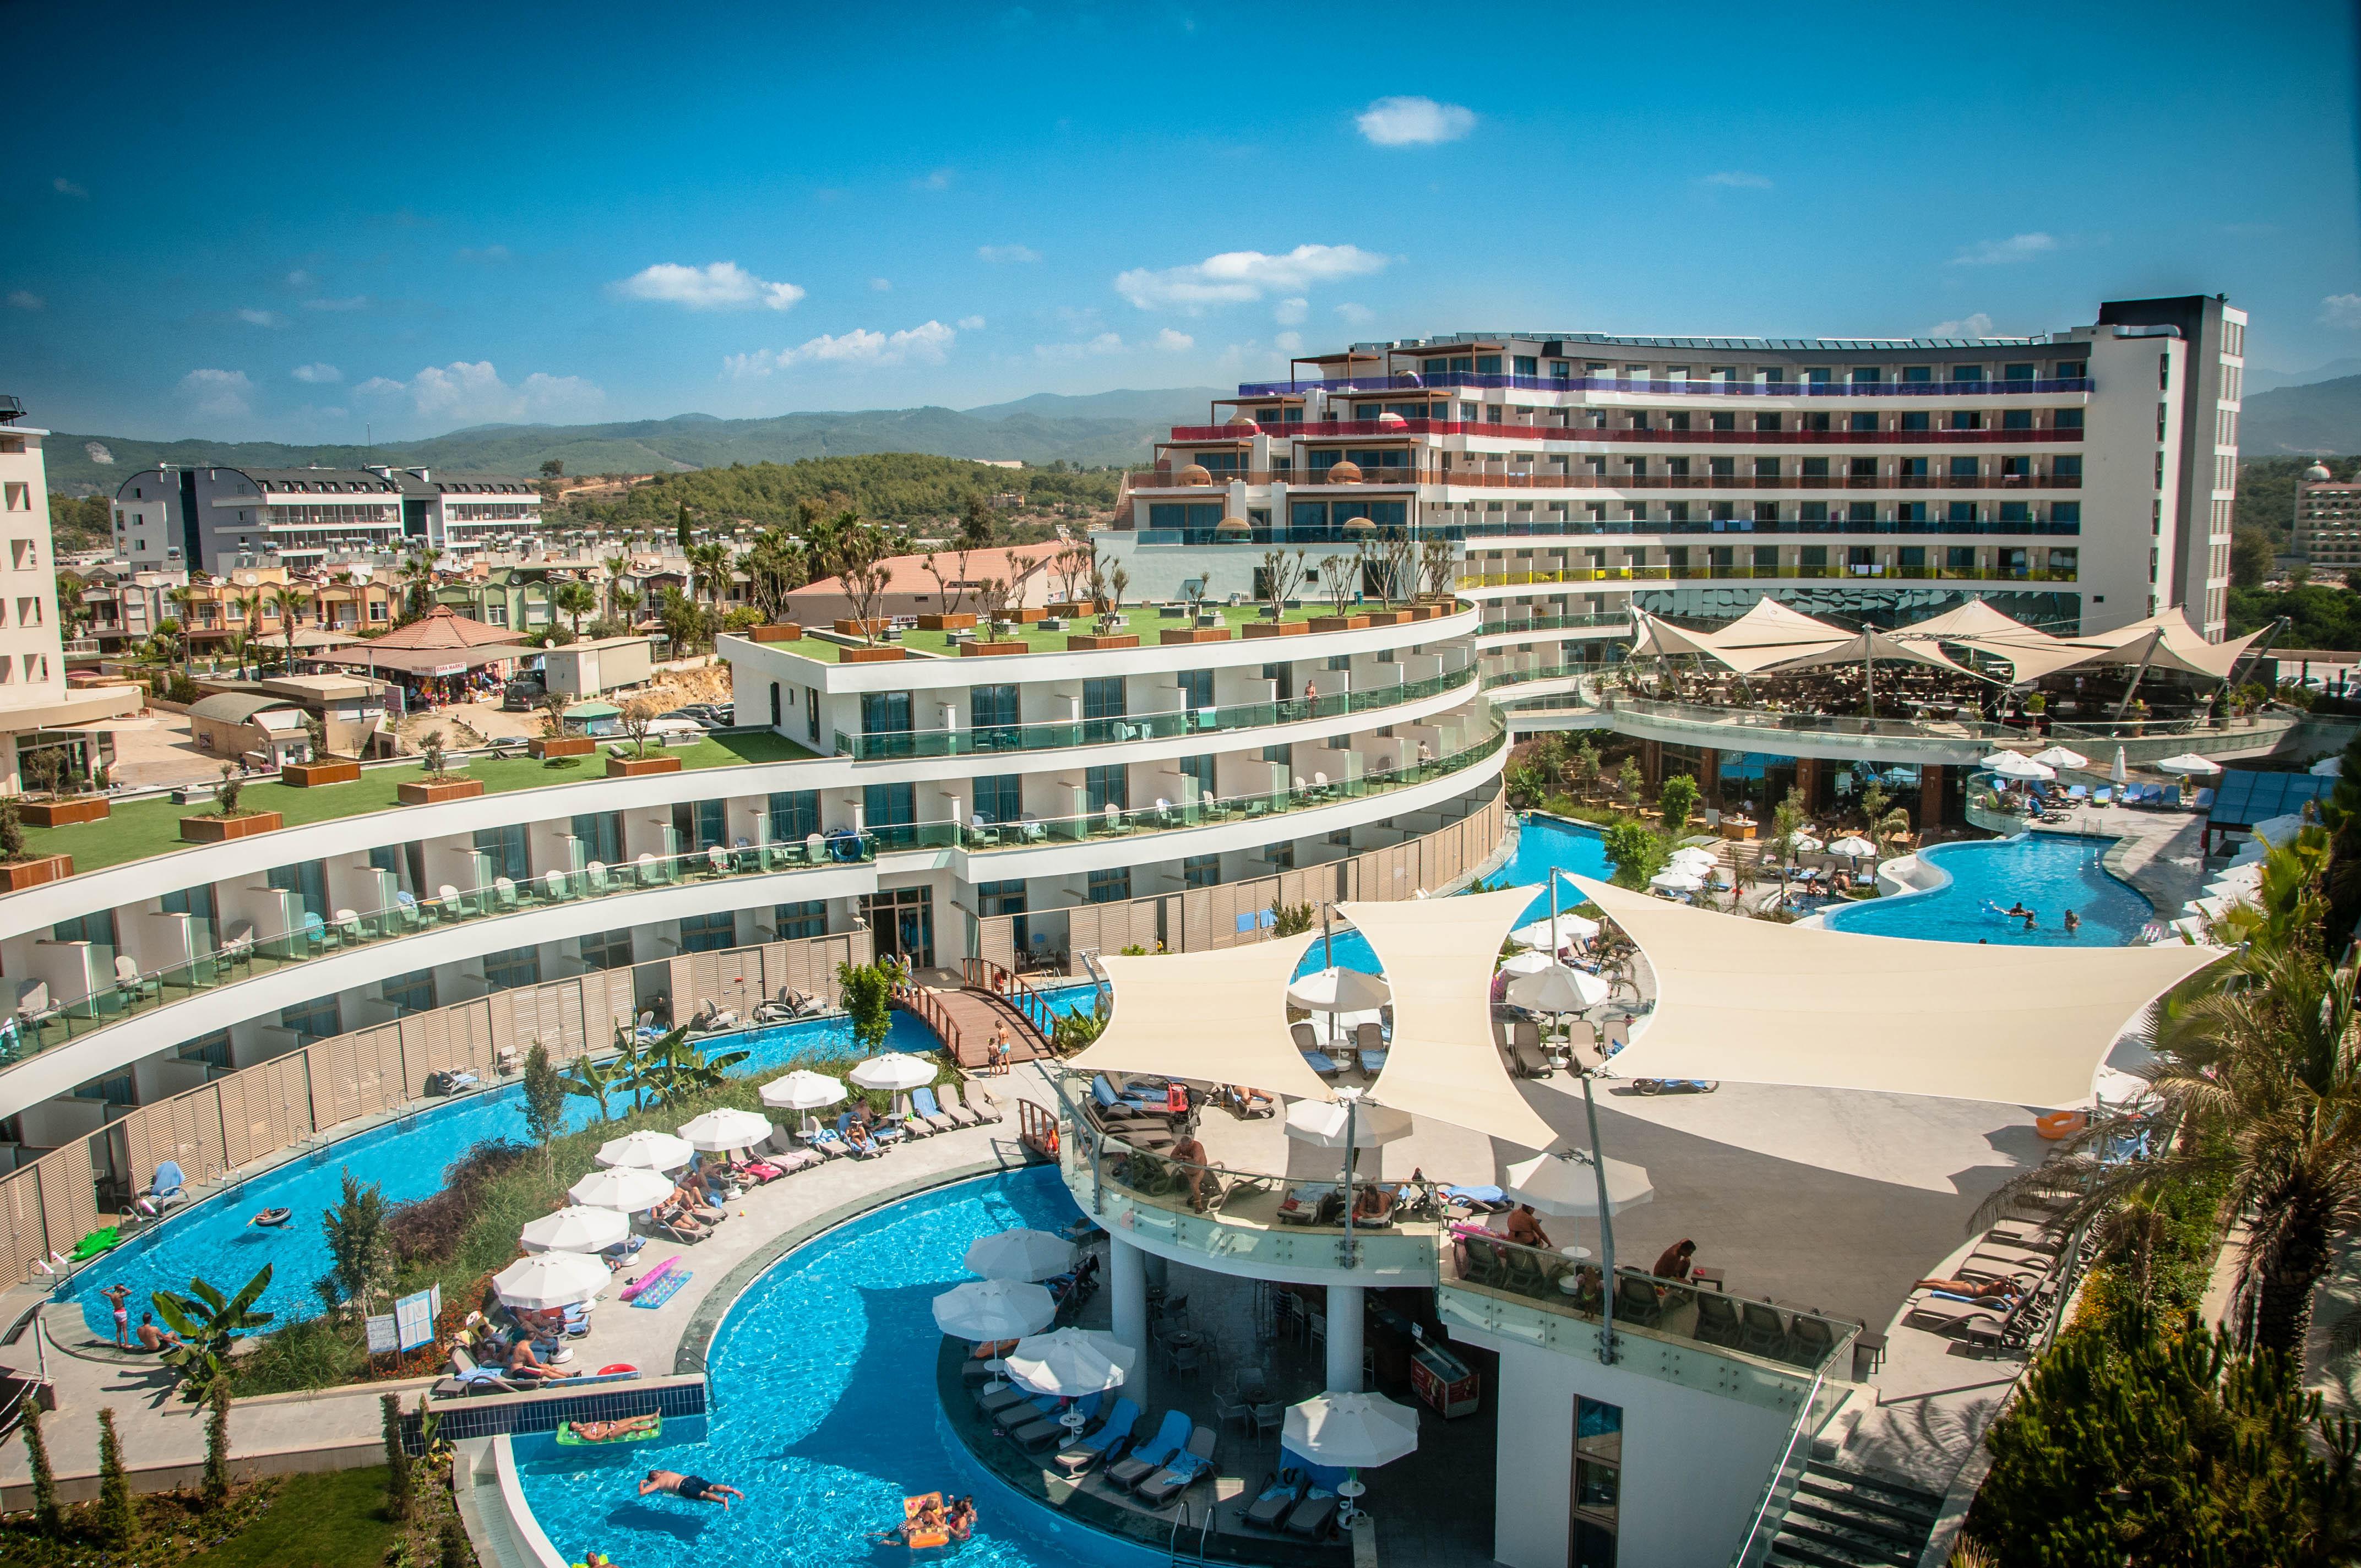 Long Beach Resort Spa Deluxe